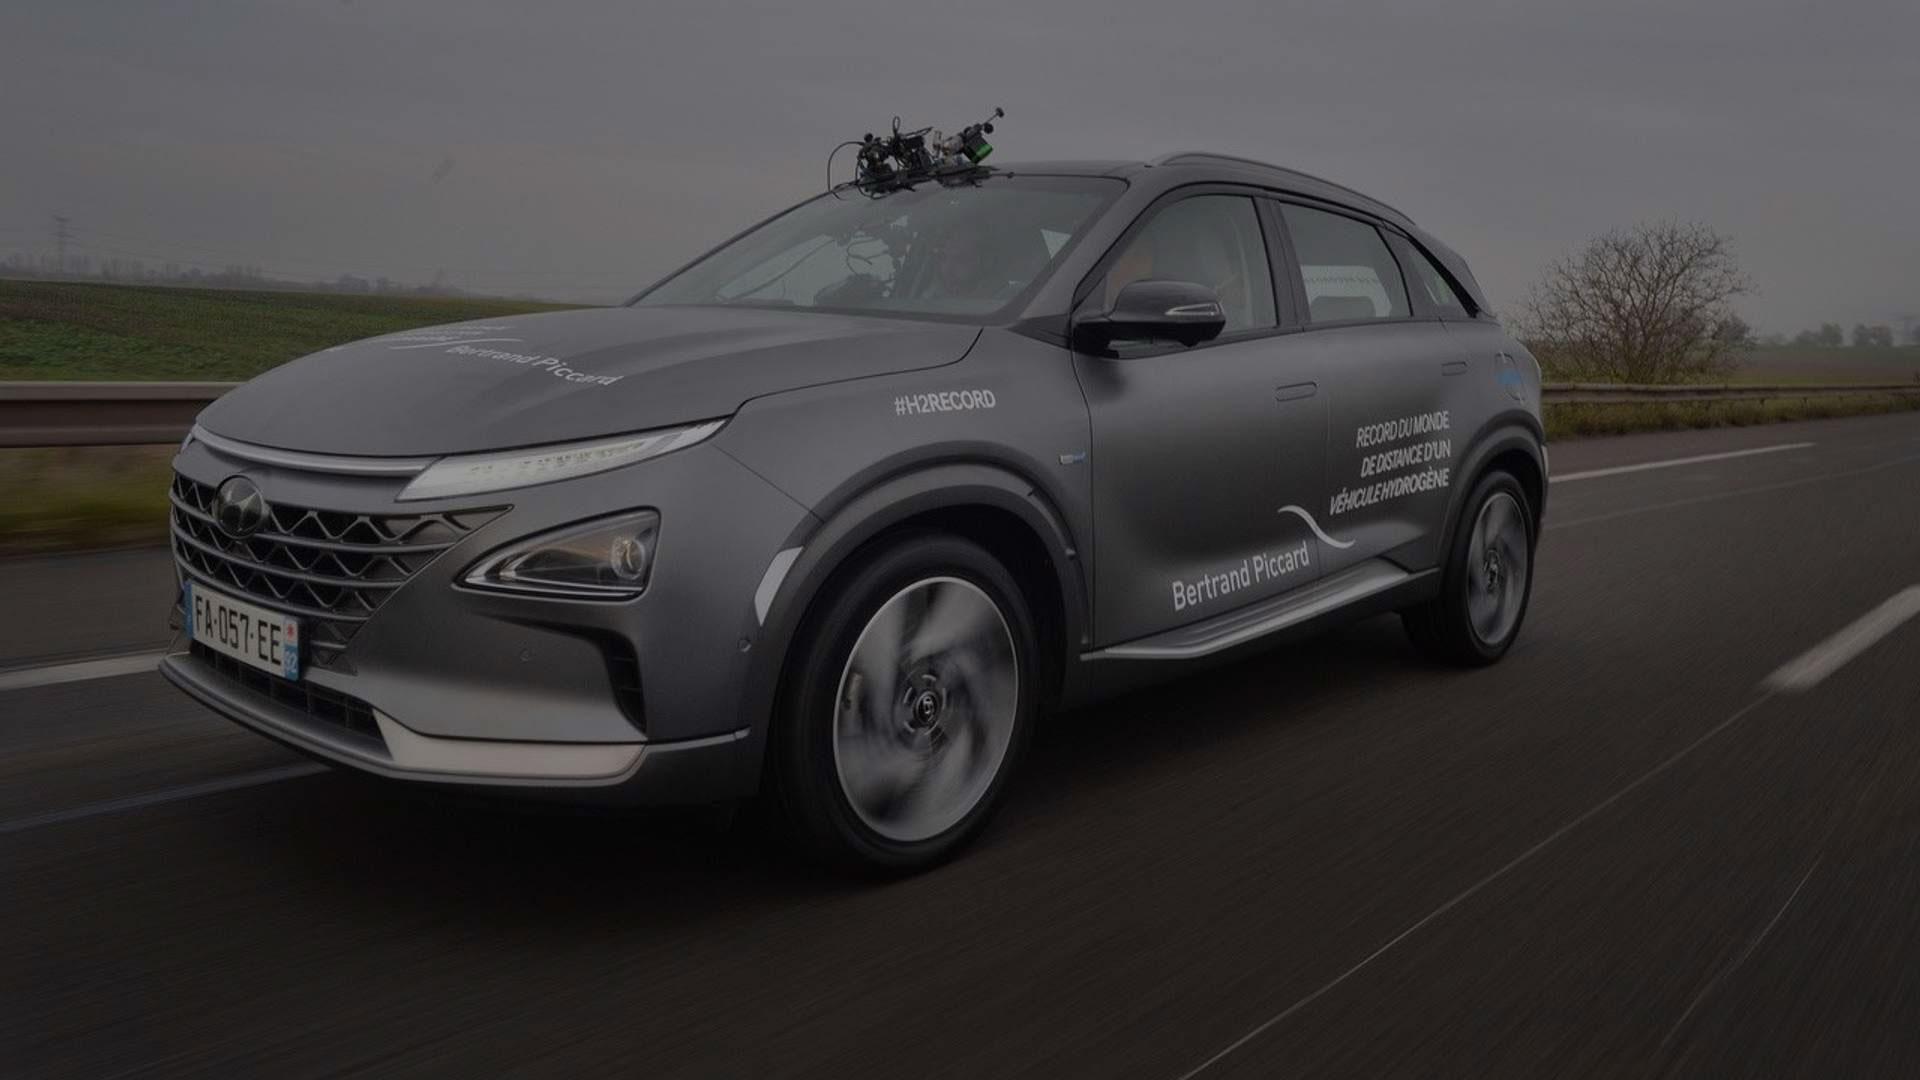 Rekordot dönt a Hyundai Nexo